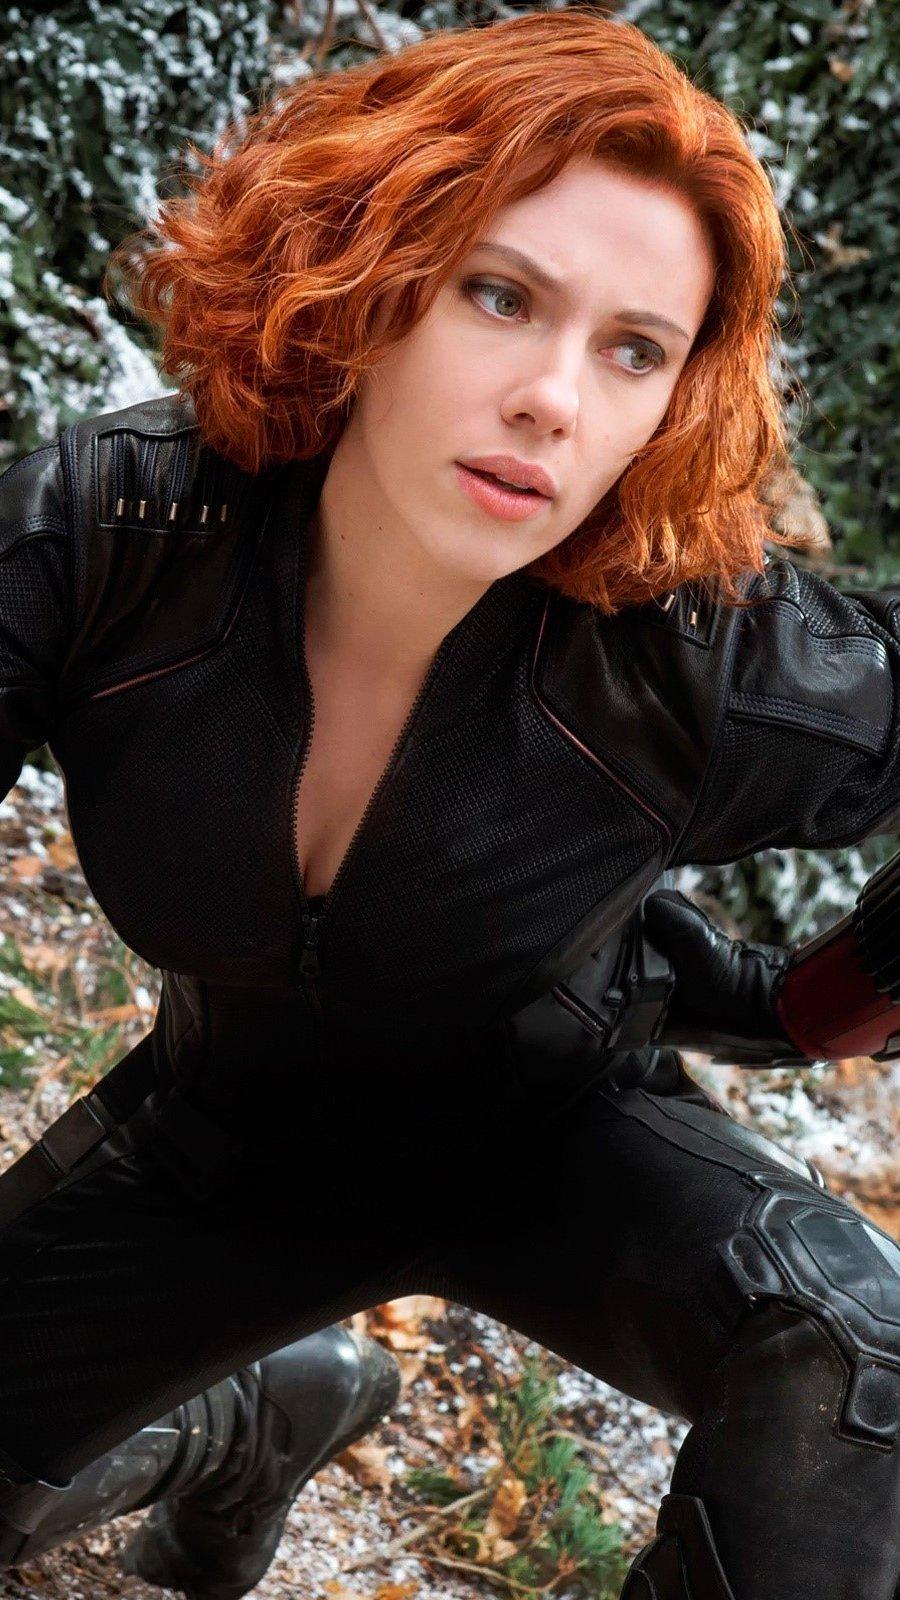 Wallpaper Black Widow in The Avengers 2 Vertical